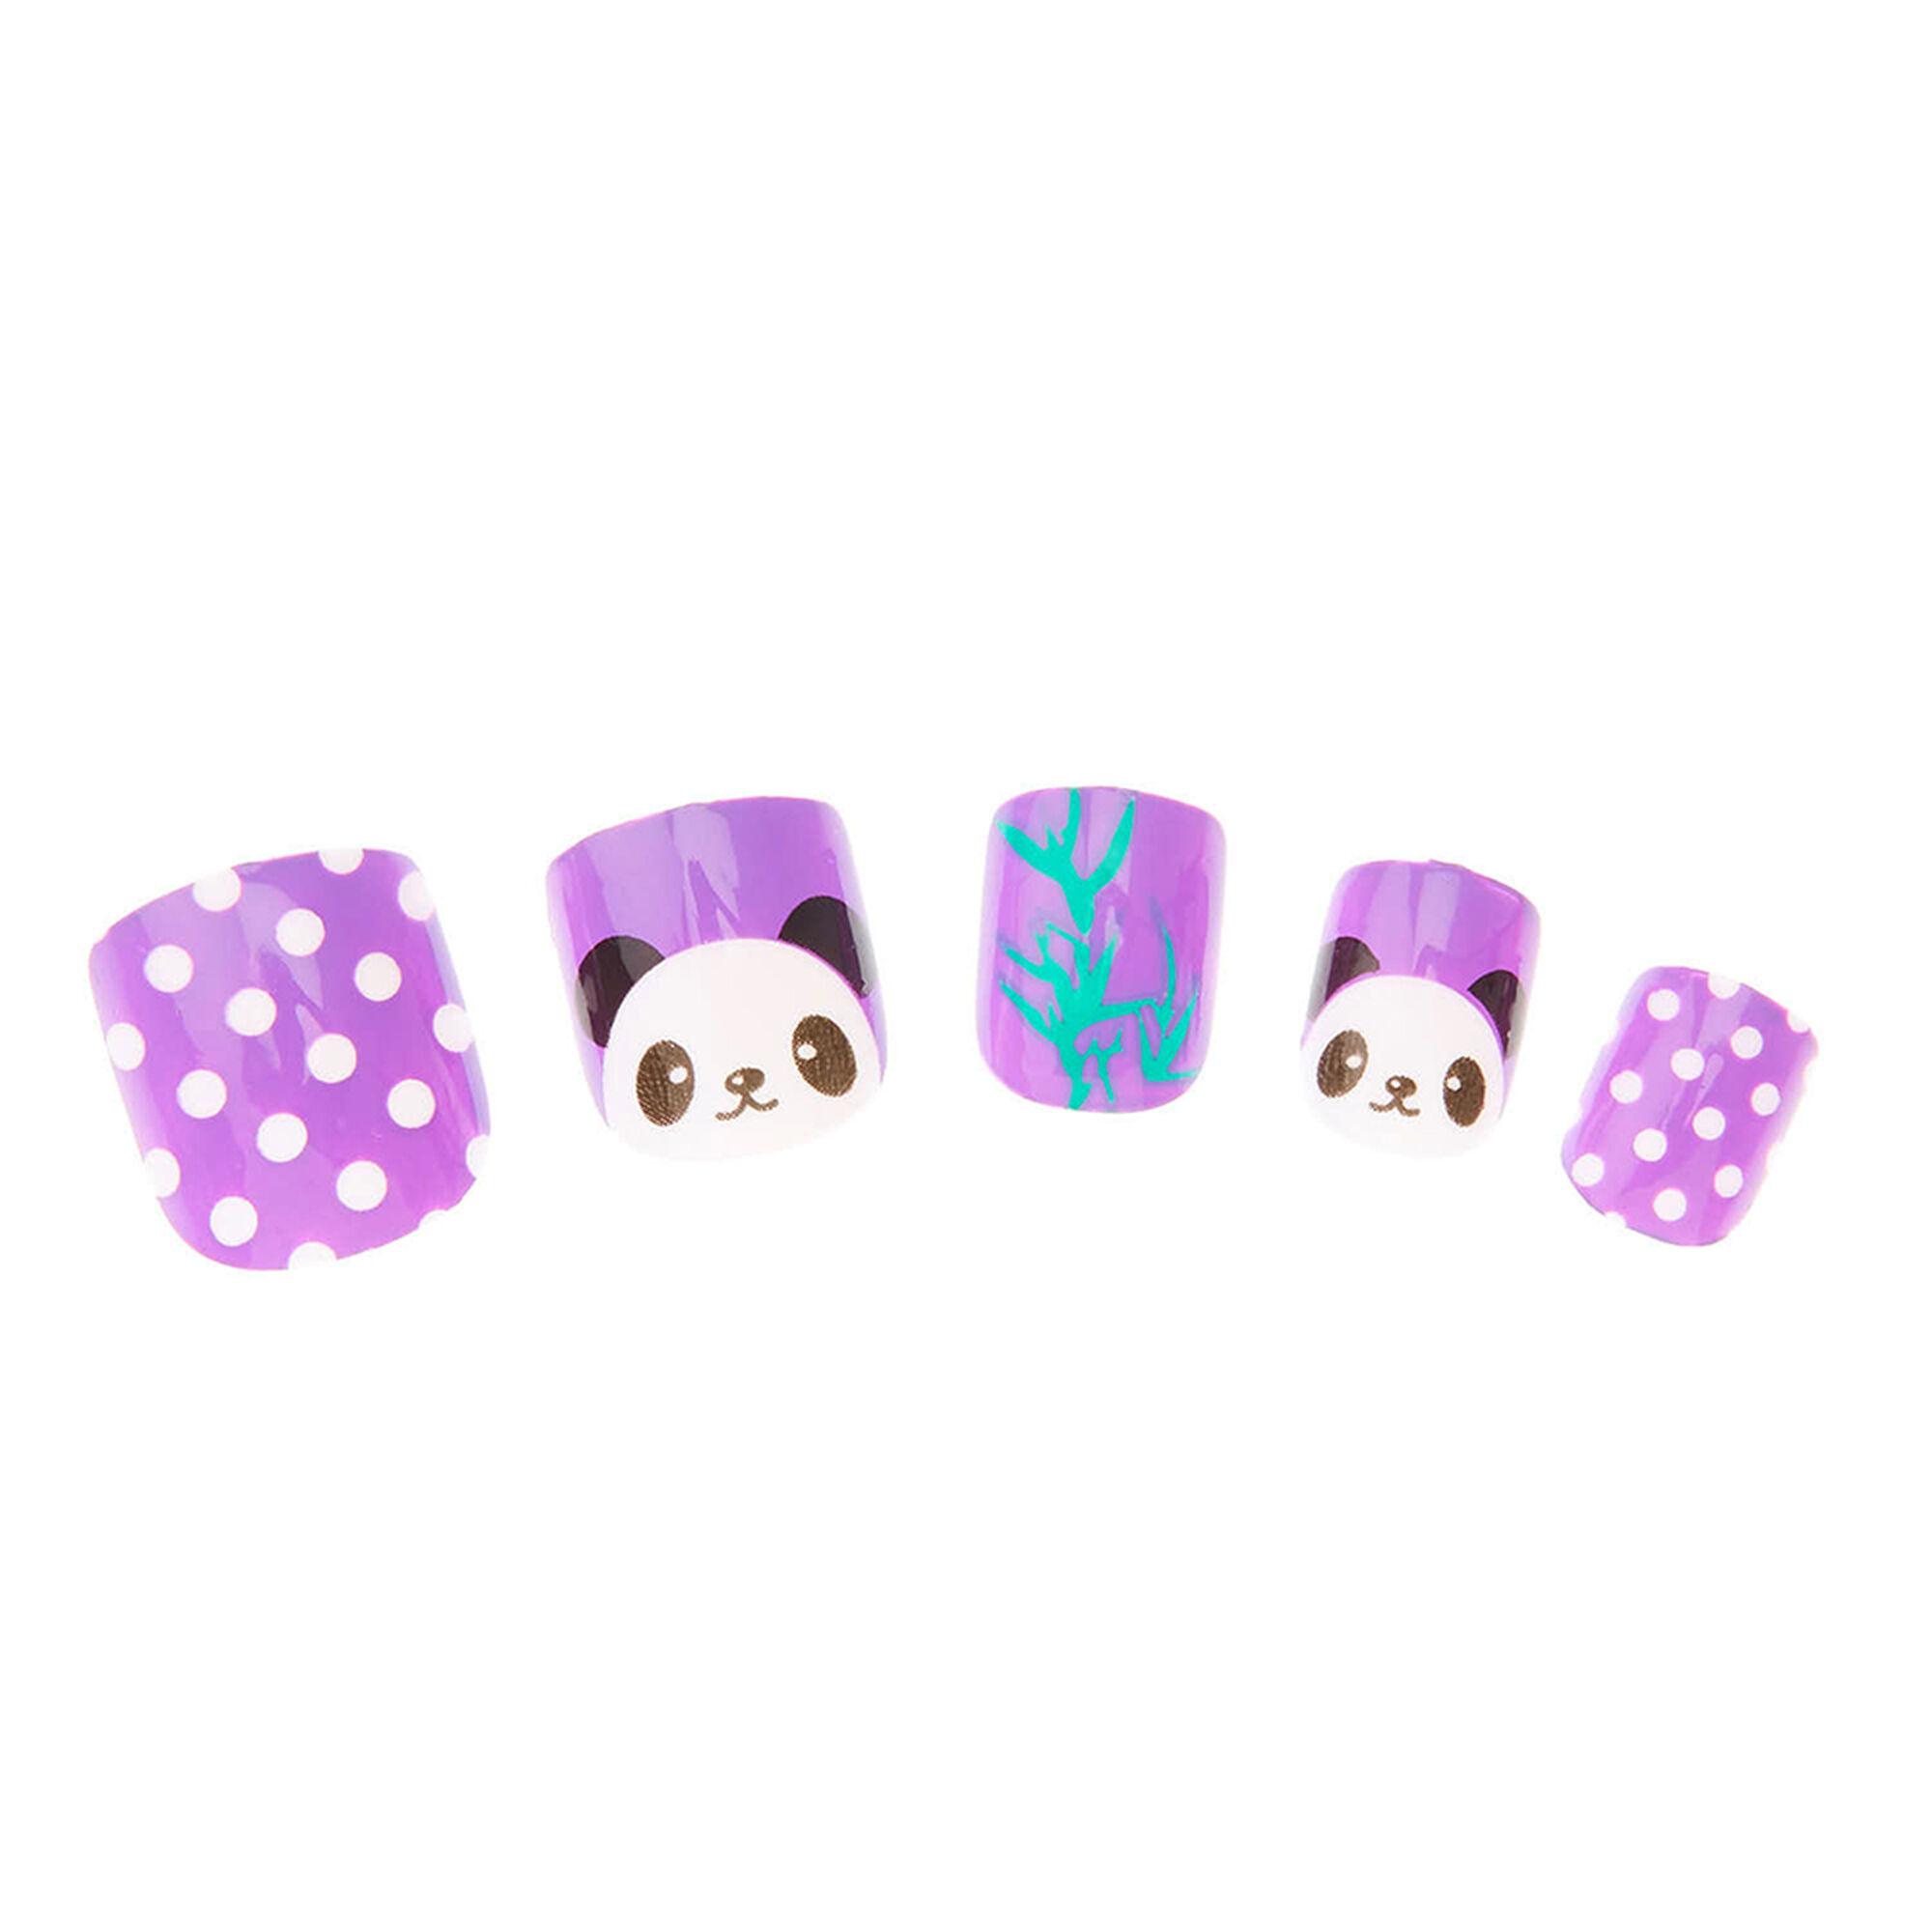 Popular fashion nails uxbridge - 24 Pack Purple Panda Faux Nails